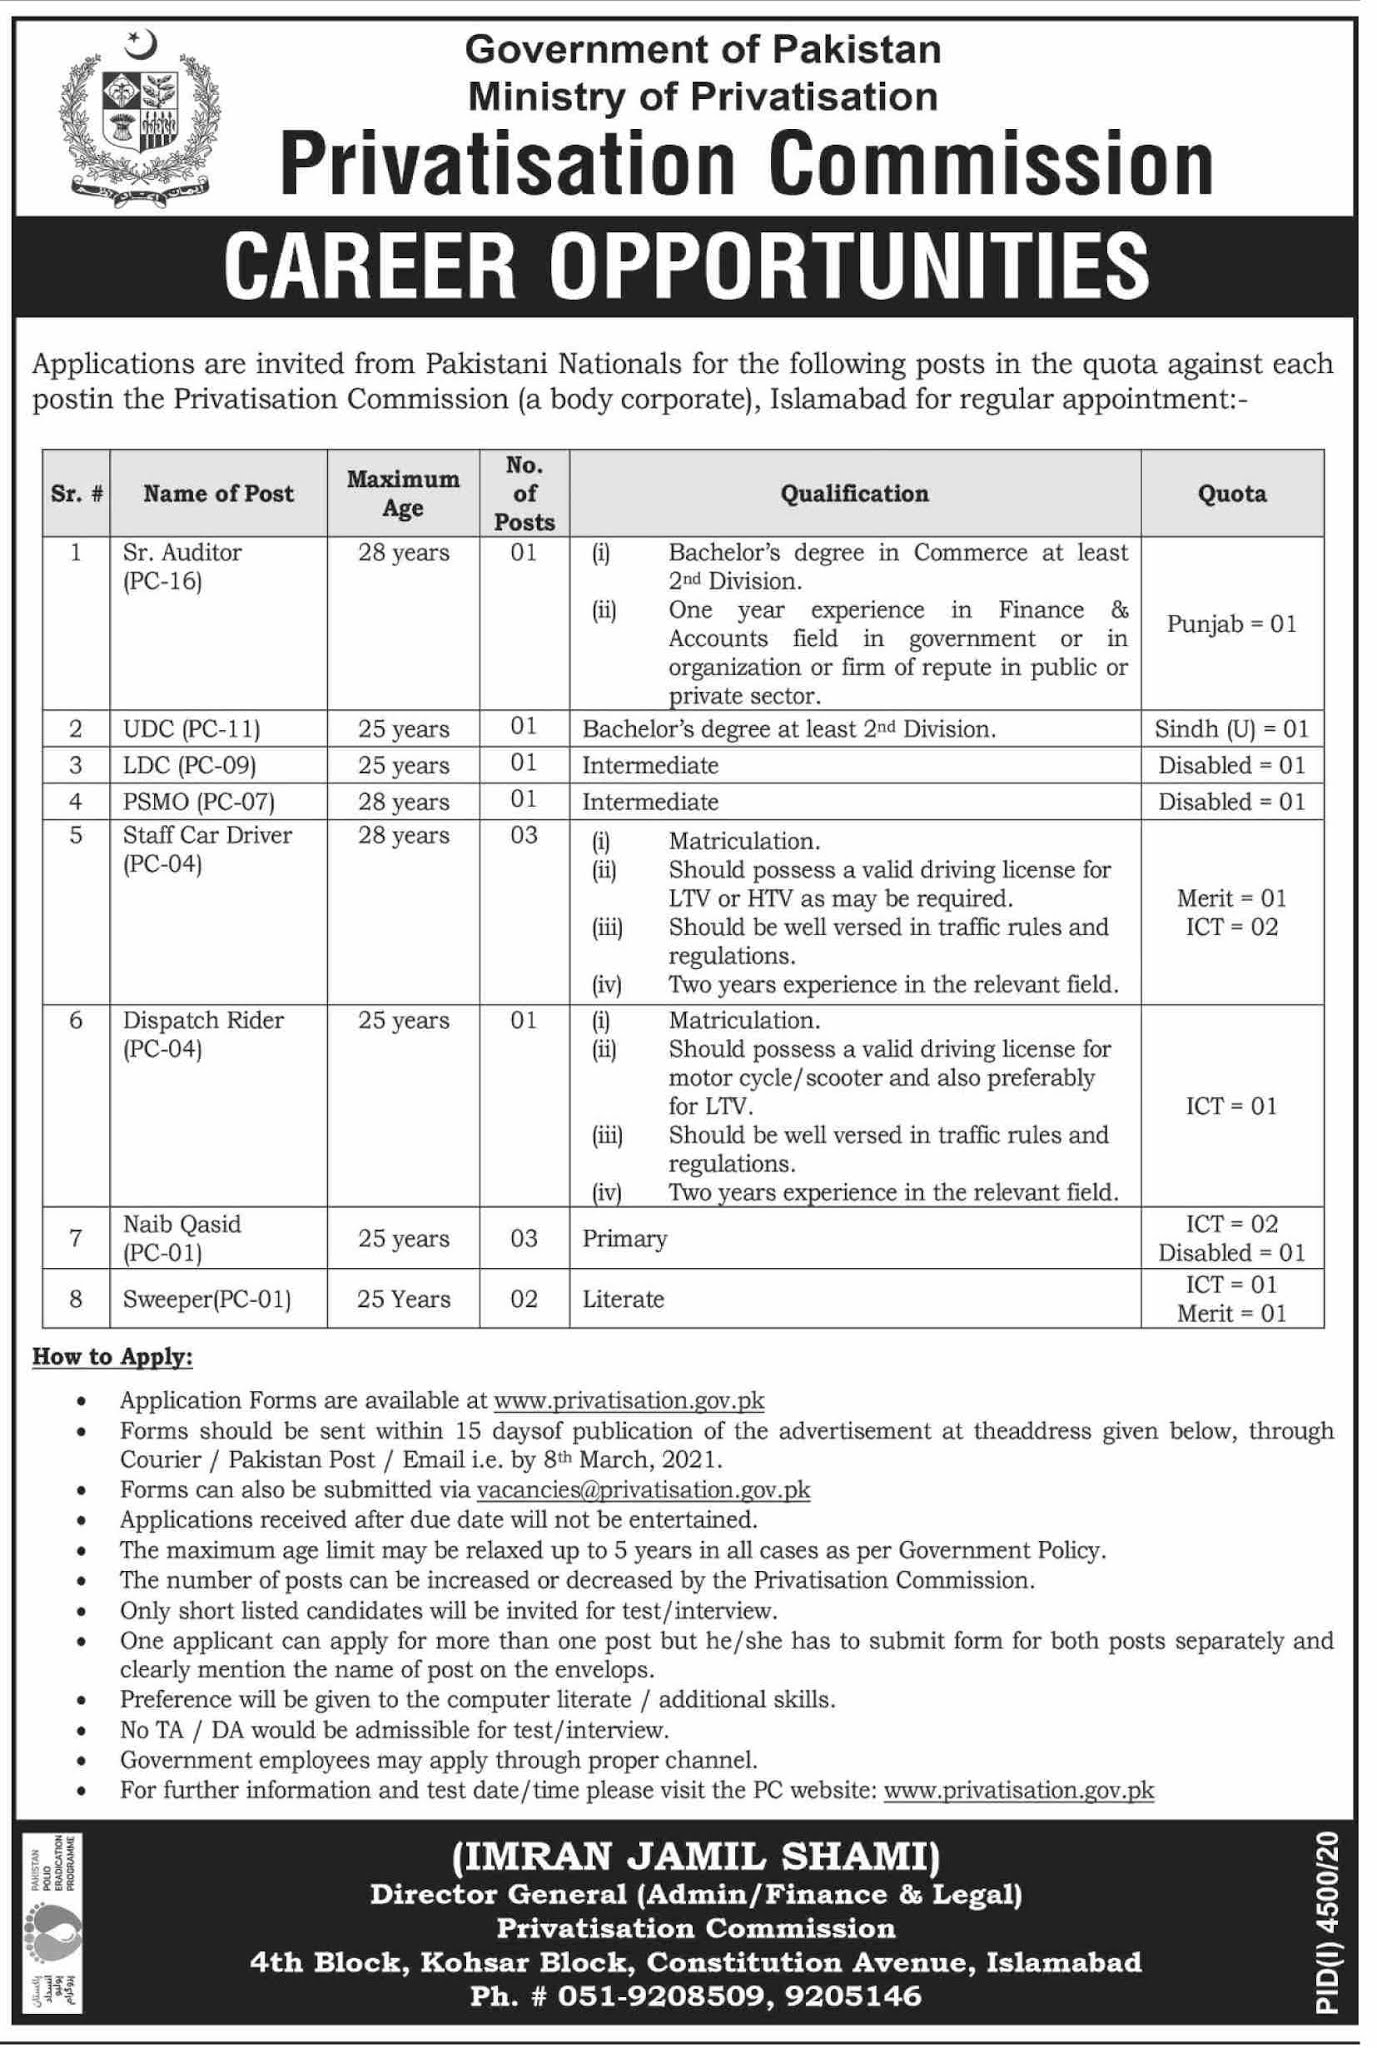 Ministry of Privatization - Privatization Commission Jobs Jobs 2021 in Pakistan - Download Job Application Form - www.privatisation.gov.pk  Send Your CV Online At - vacancies@privatisation.gov.pk